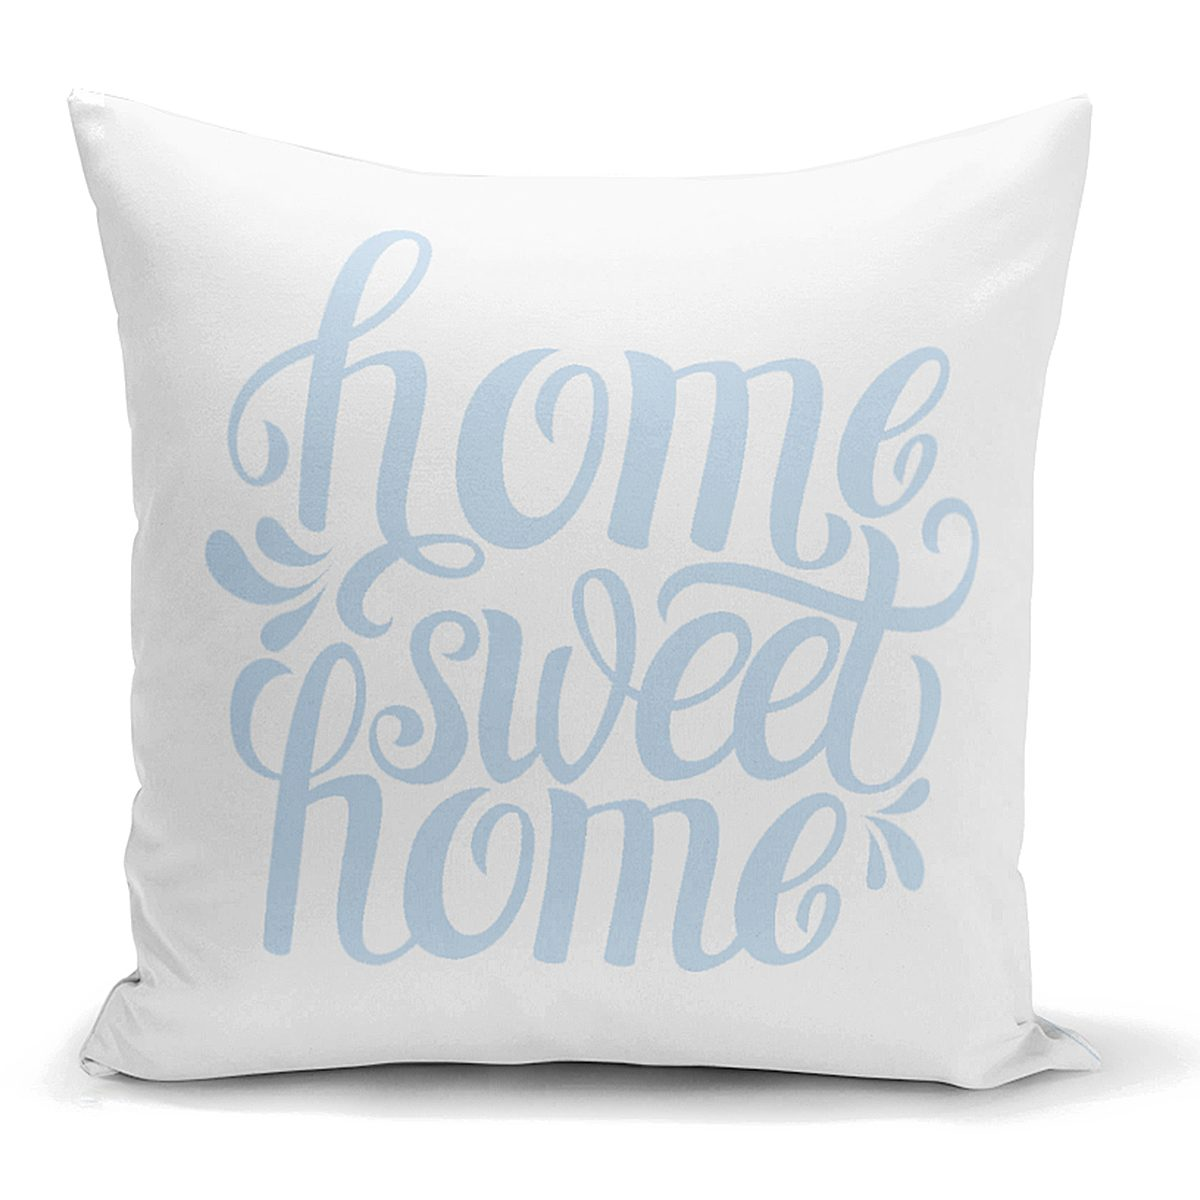 Mavi Home Sweet Home Modern Yastık Kırlent Kılıfı Realhomes